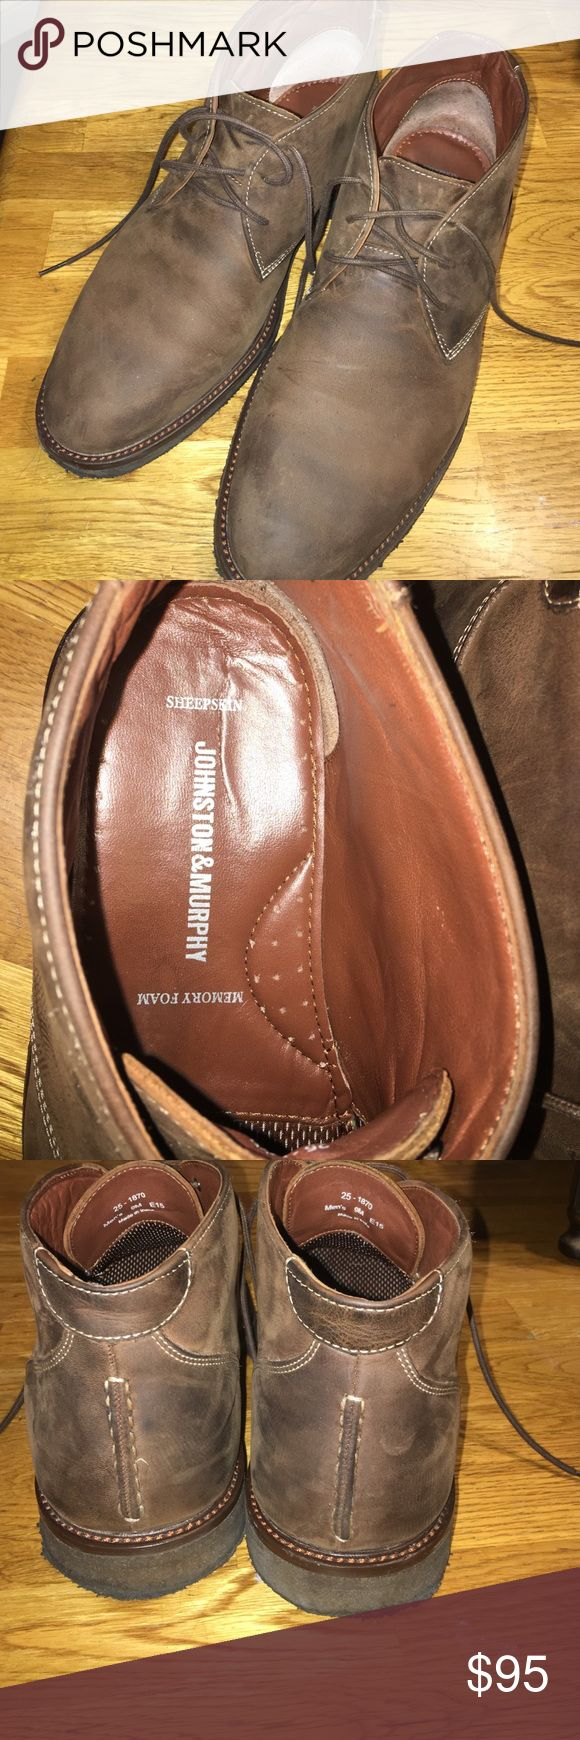 Johnston and Murphy Men's sheepskin chukka boot Johnston and Murphy Men's sheepskin chukka boot . Worn 3 times. 9M Johnston & Murphy Shoes Chukka Boots